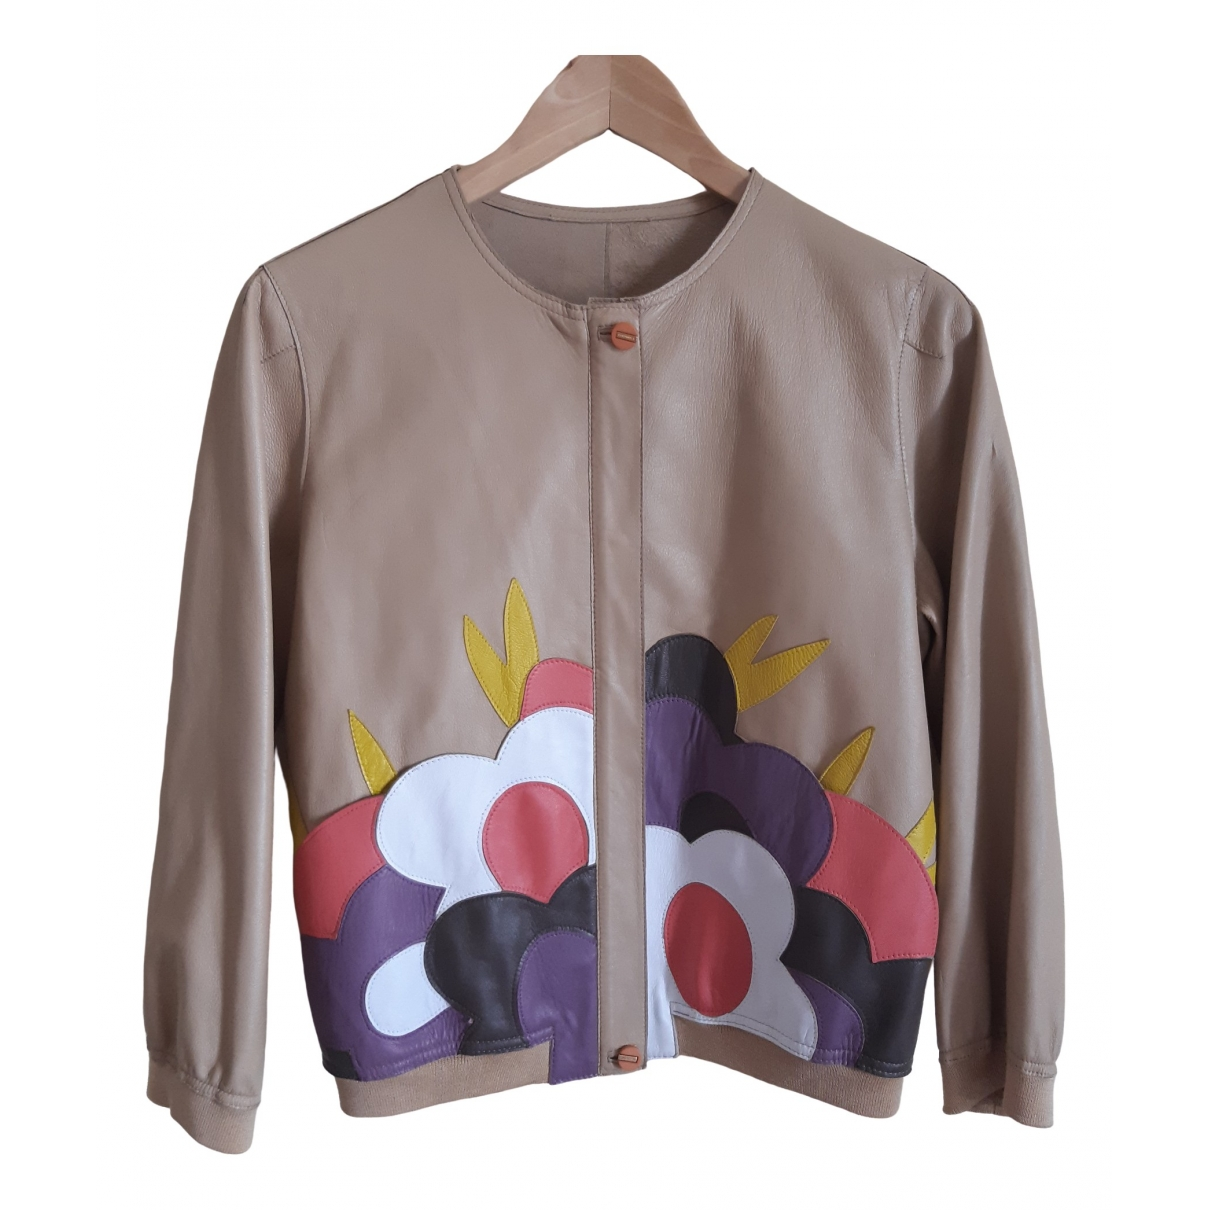 Fendissime \N Beige Leather jacket for Women S International